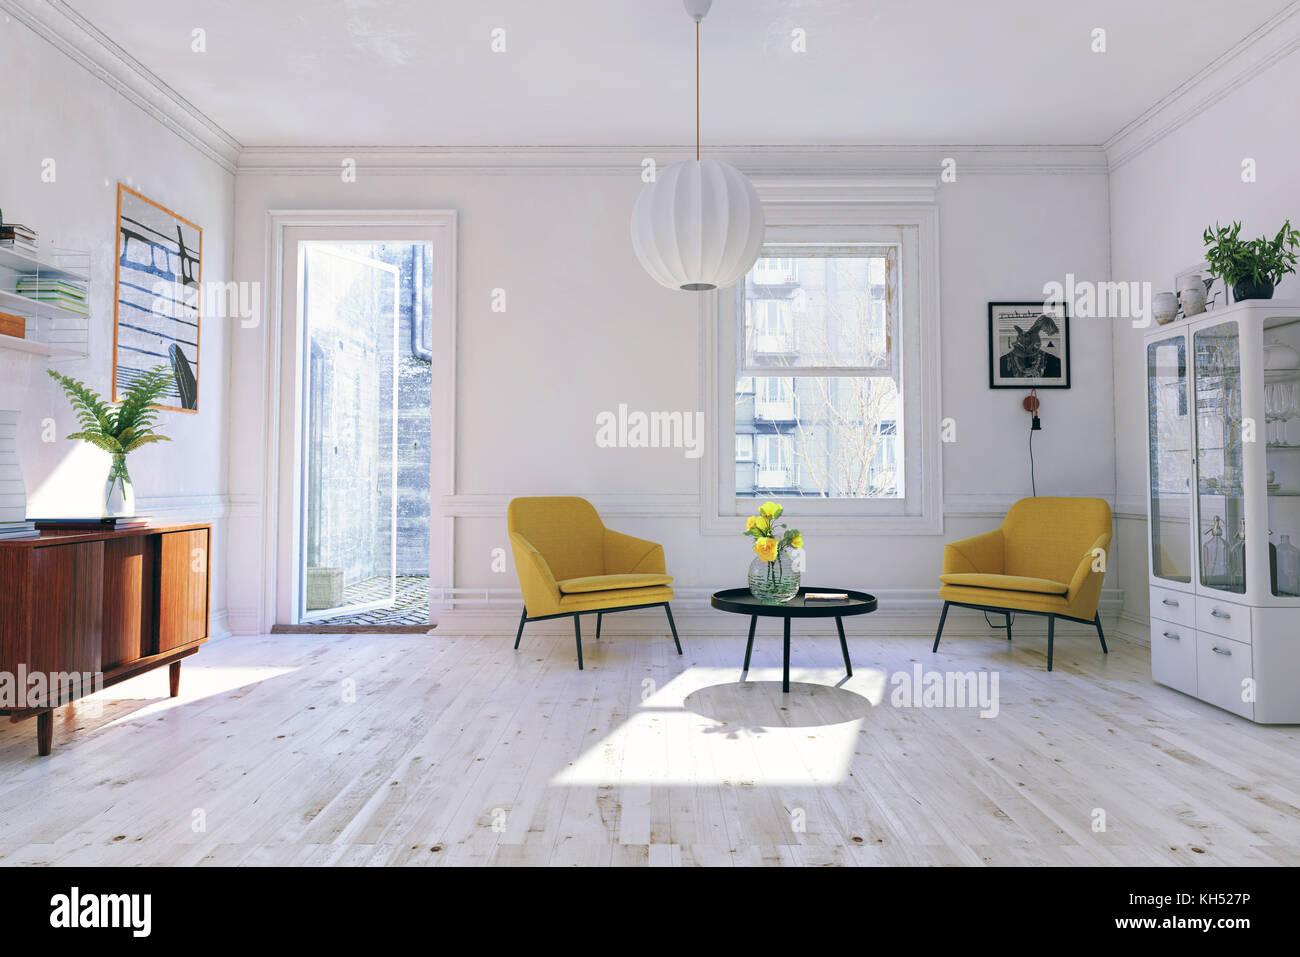 Das moderne Interieur. skandinavischen Flair. 3D Rendering illustration Konzept Stockbild